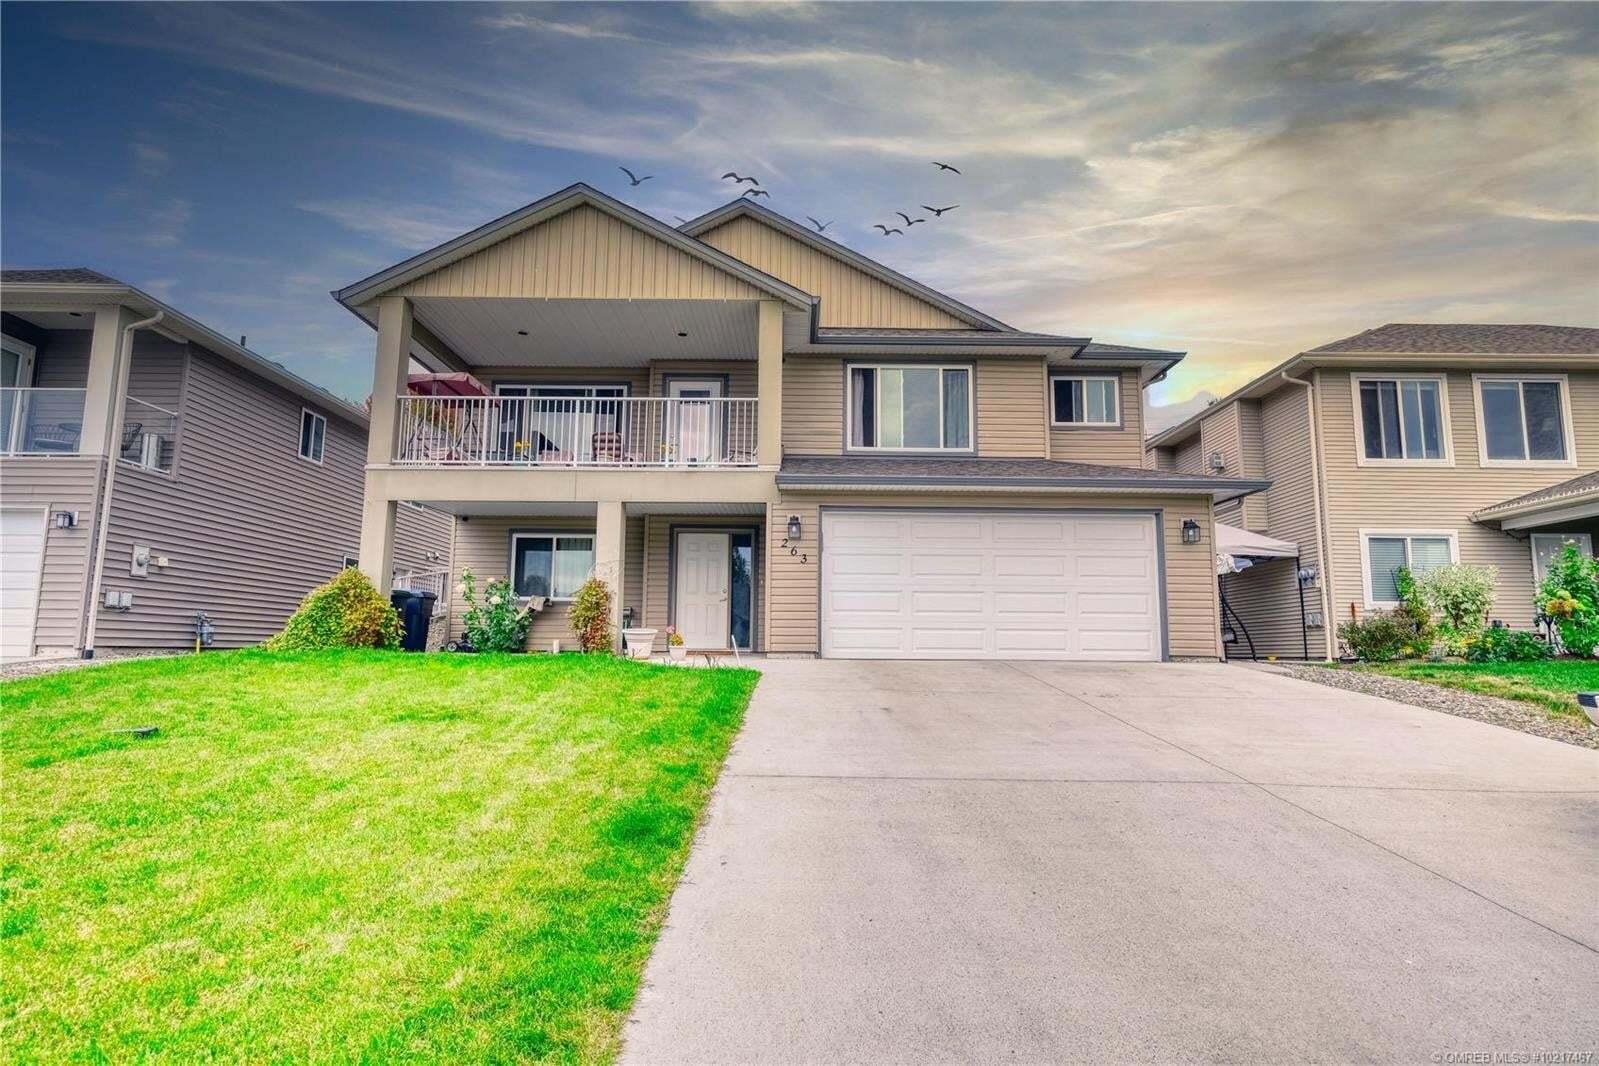 House for sale at 263 Poonian St North Kelowna British Columbia - MLS: 10217467